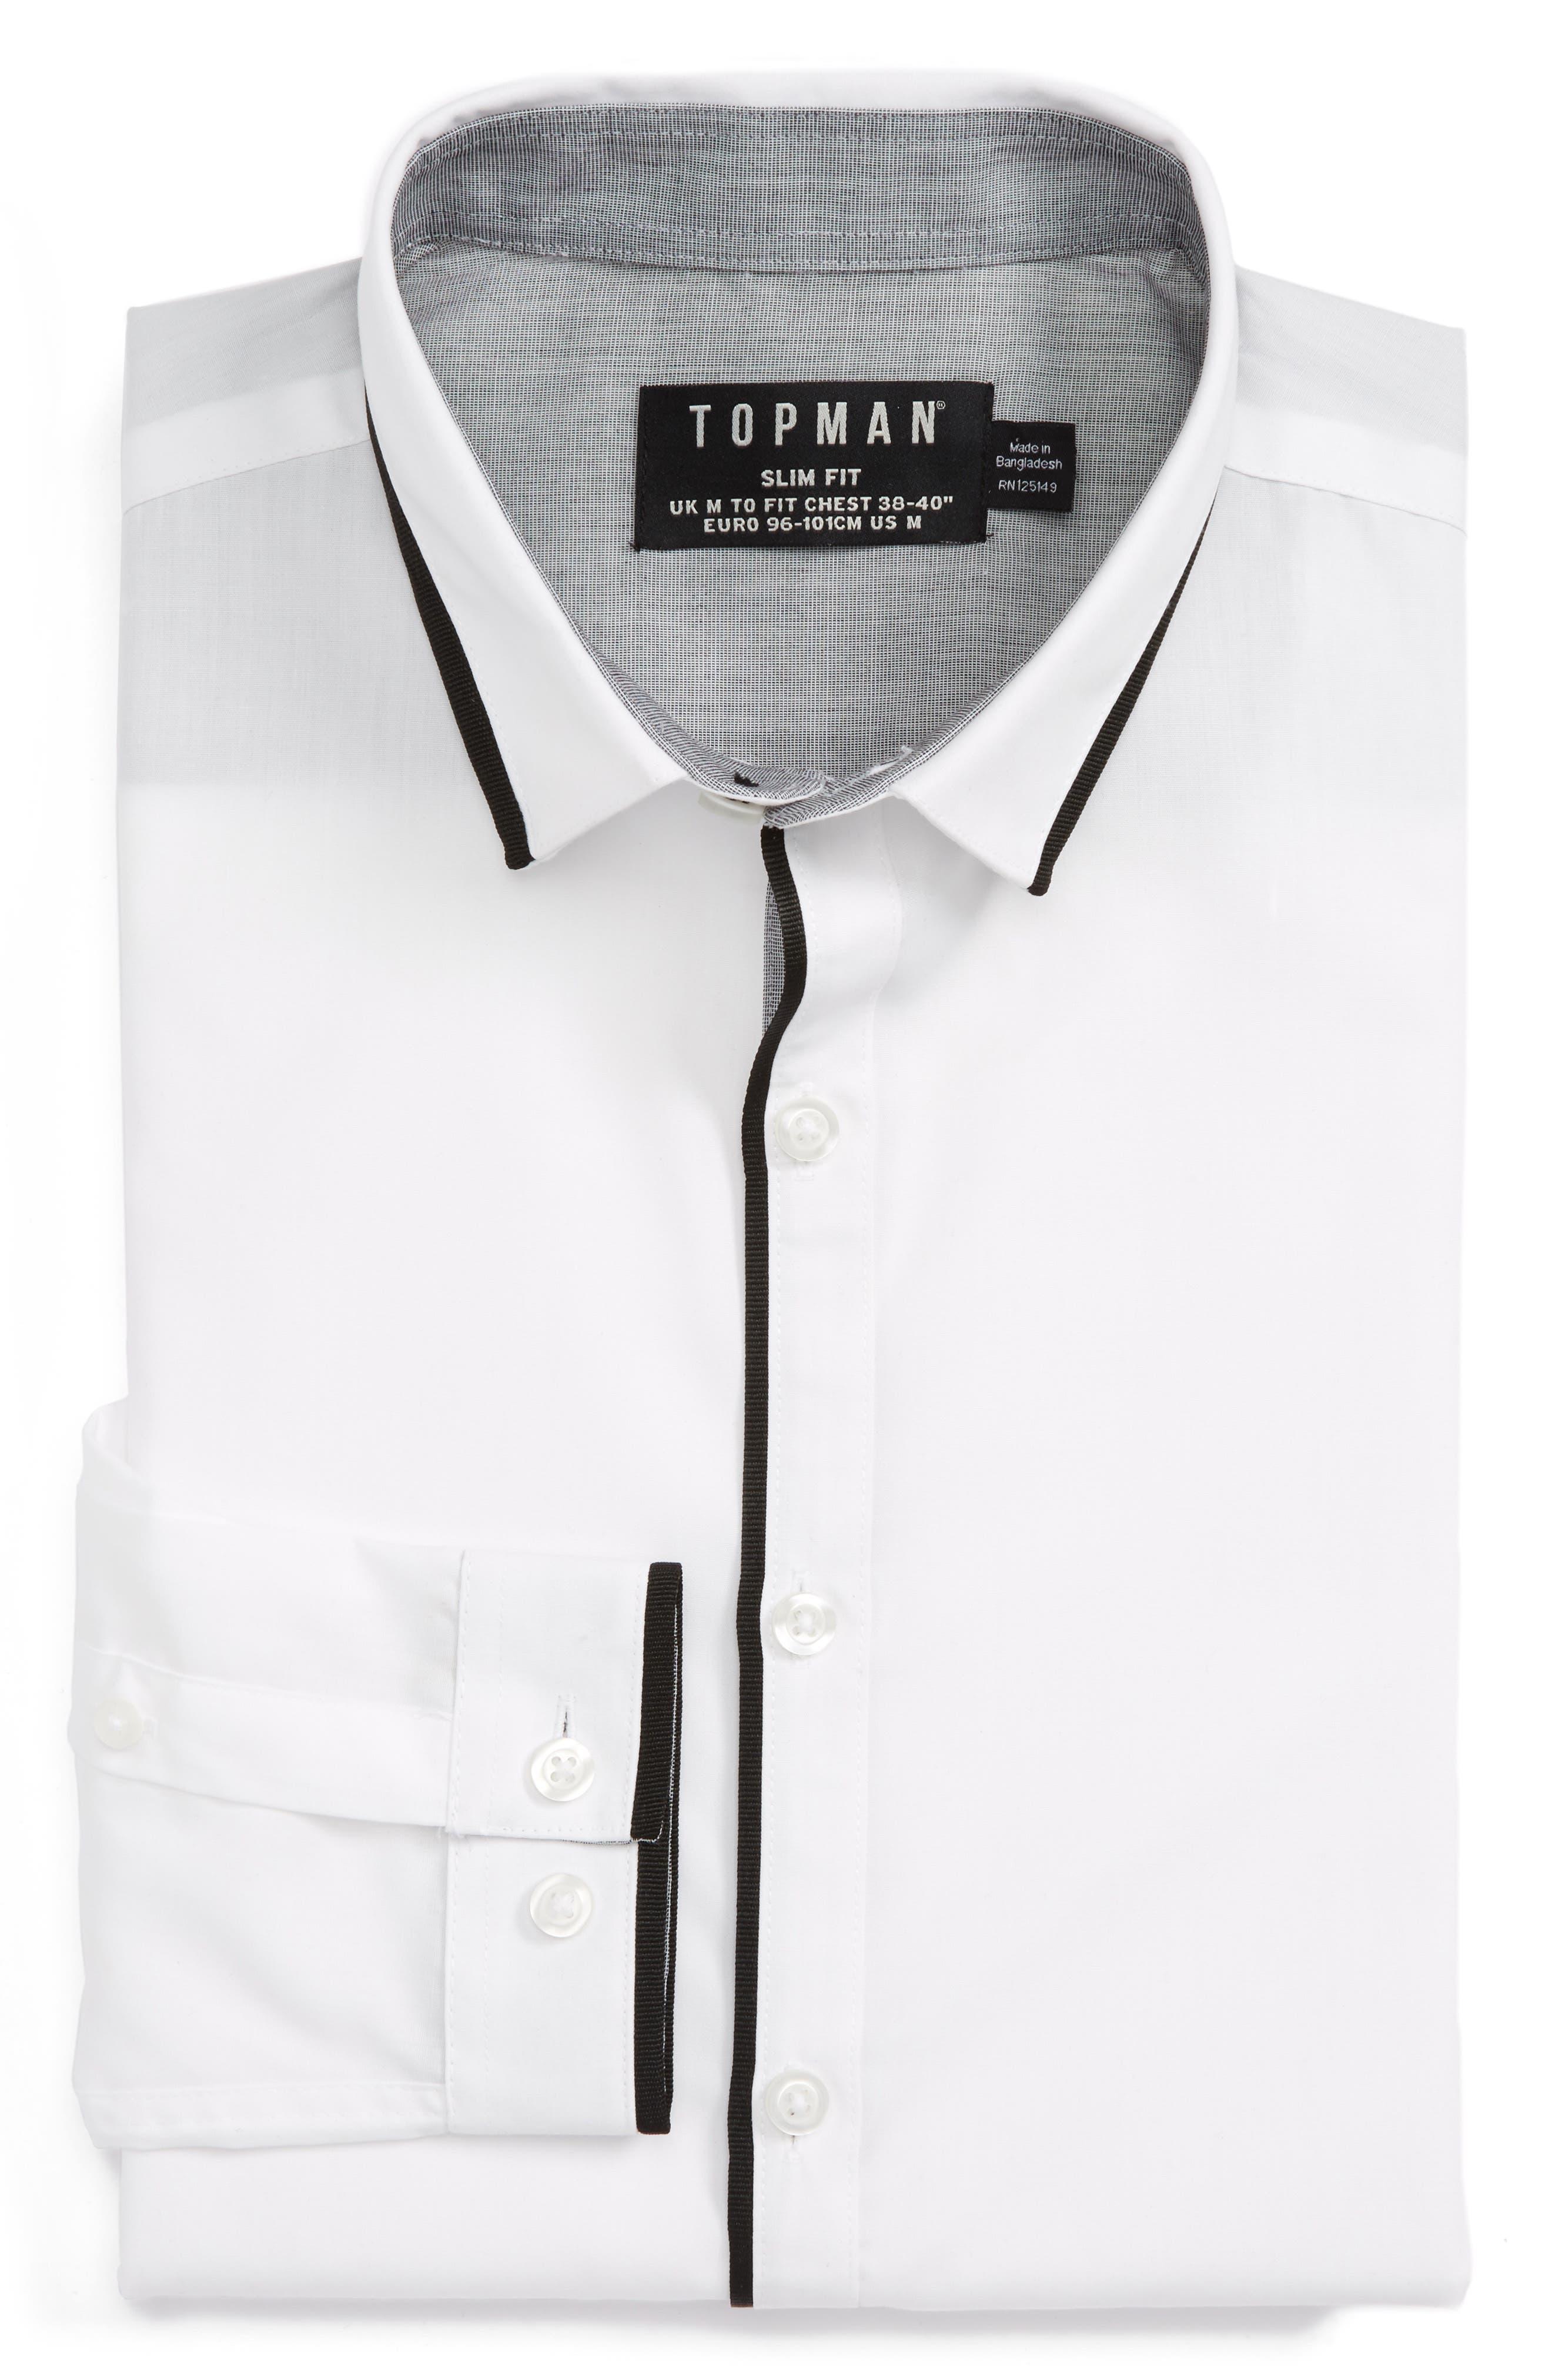 Topman Slim Fit Contrast Dress Shirt